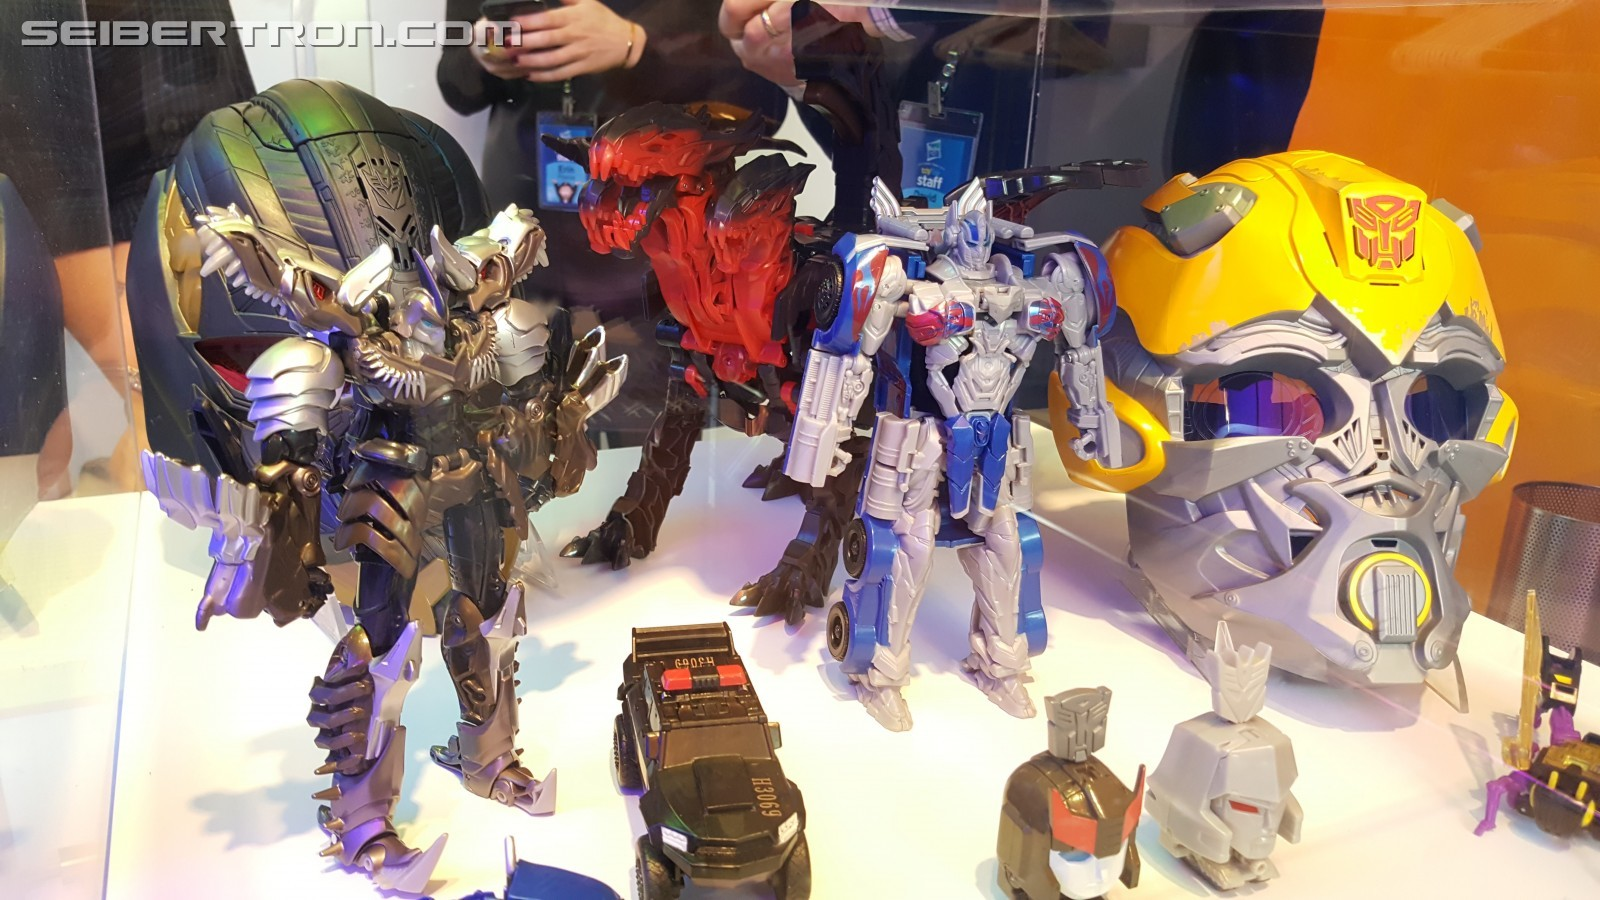 Transformers News: Toy Fair 2017 - Sneak Peek at Megatron Voice Changer Helmet and Dragon Toy